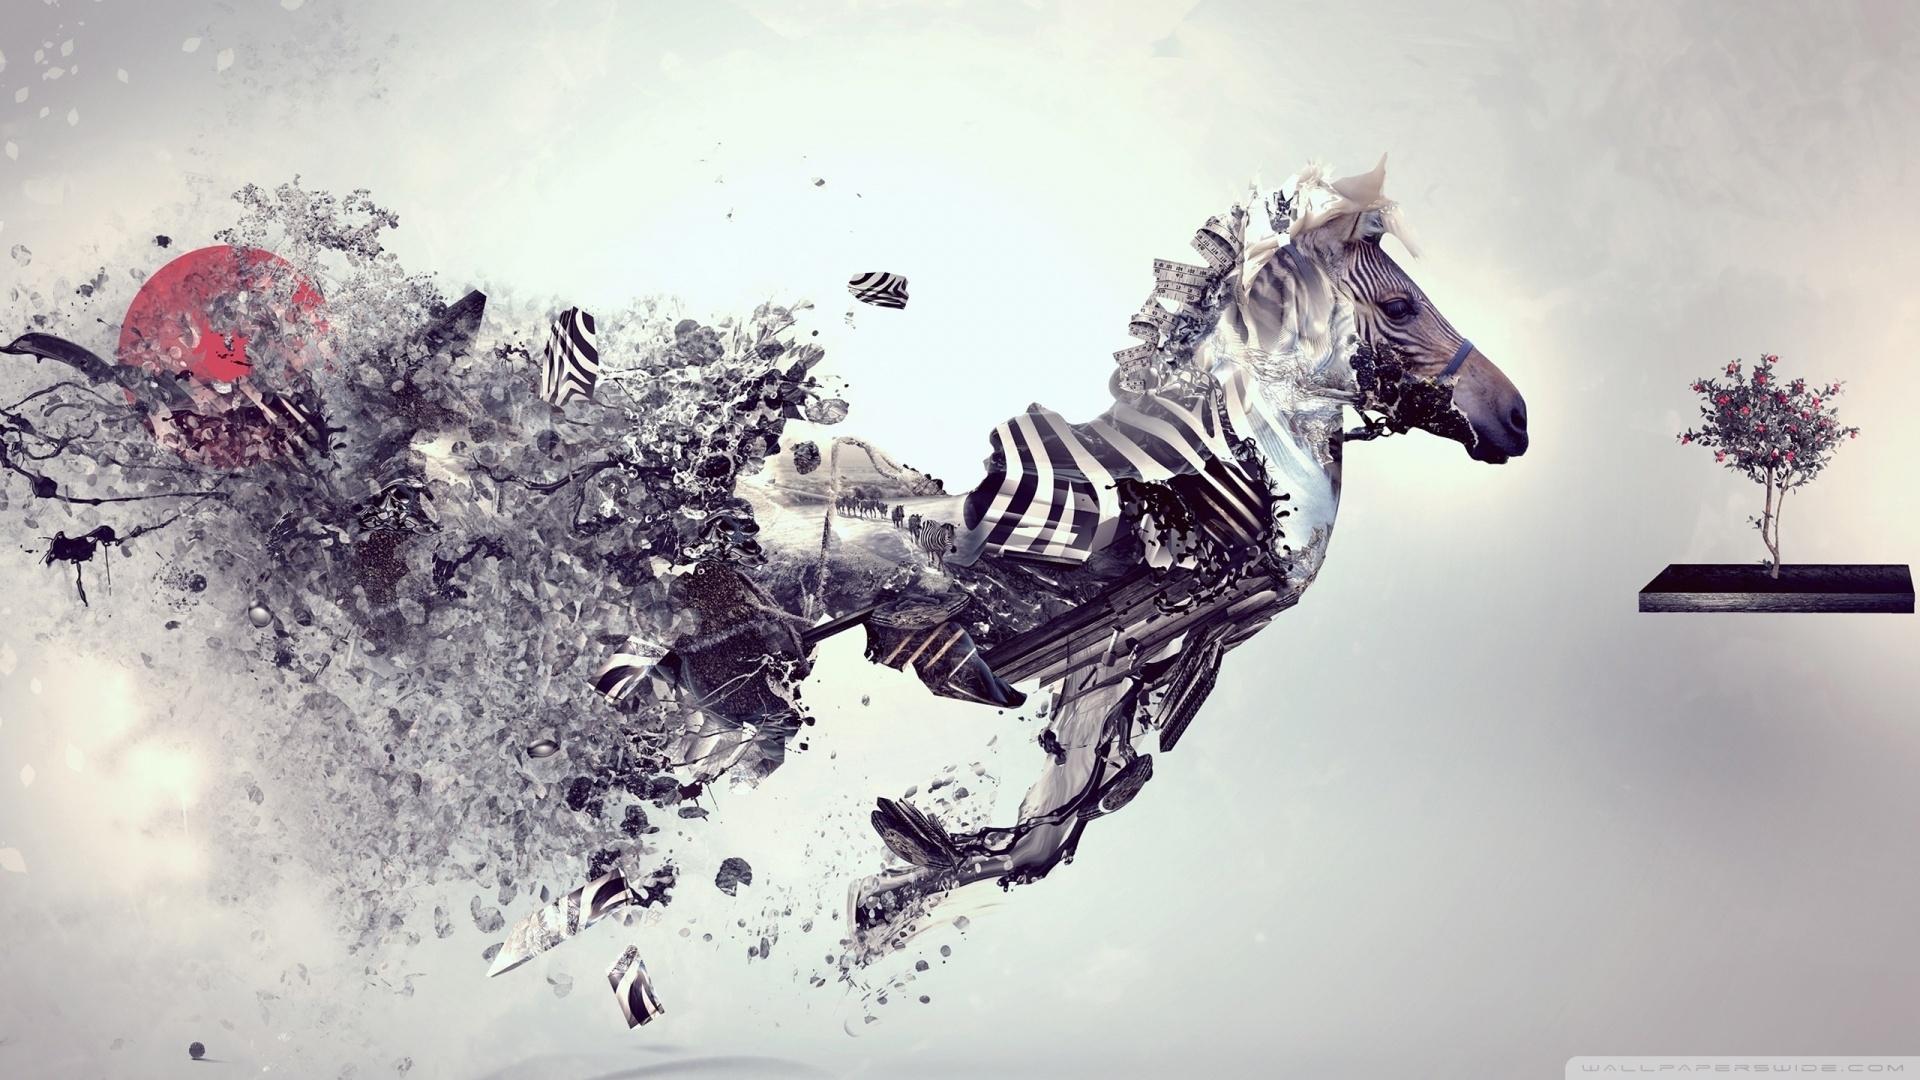 abstract zebra ❤ 4k hd desktop wallpaper for 4k ultra hd tv